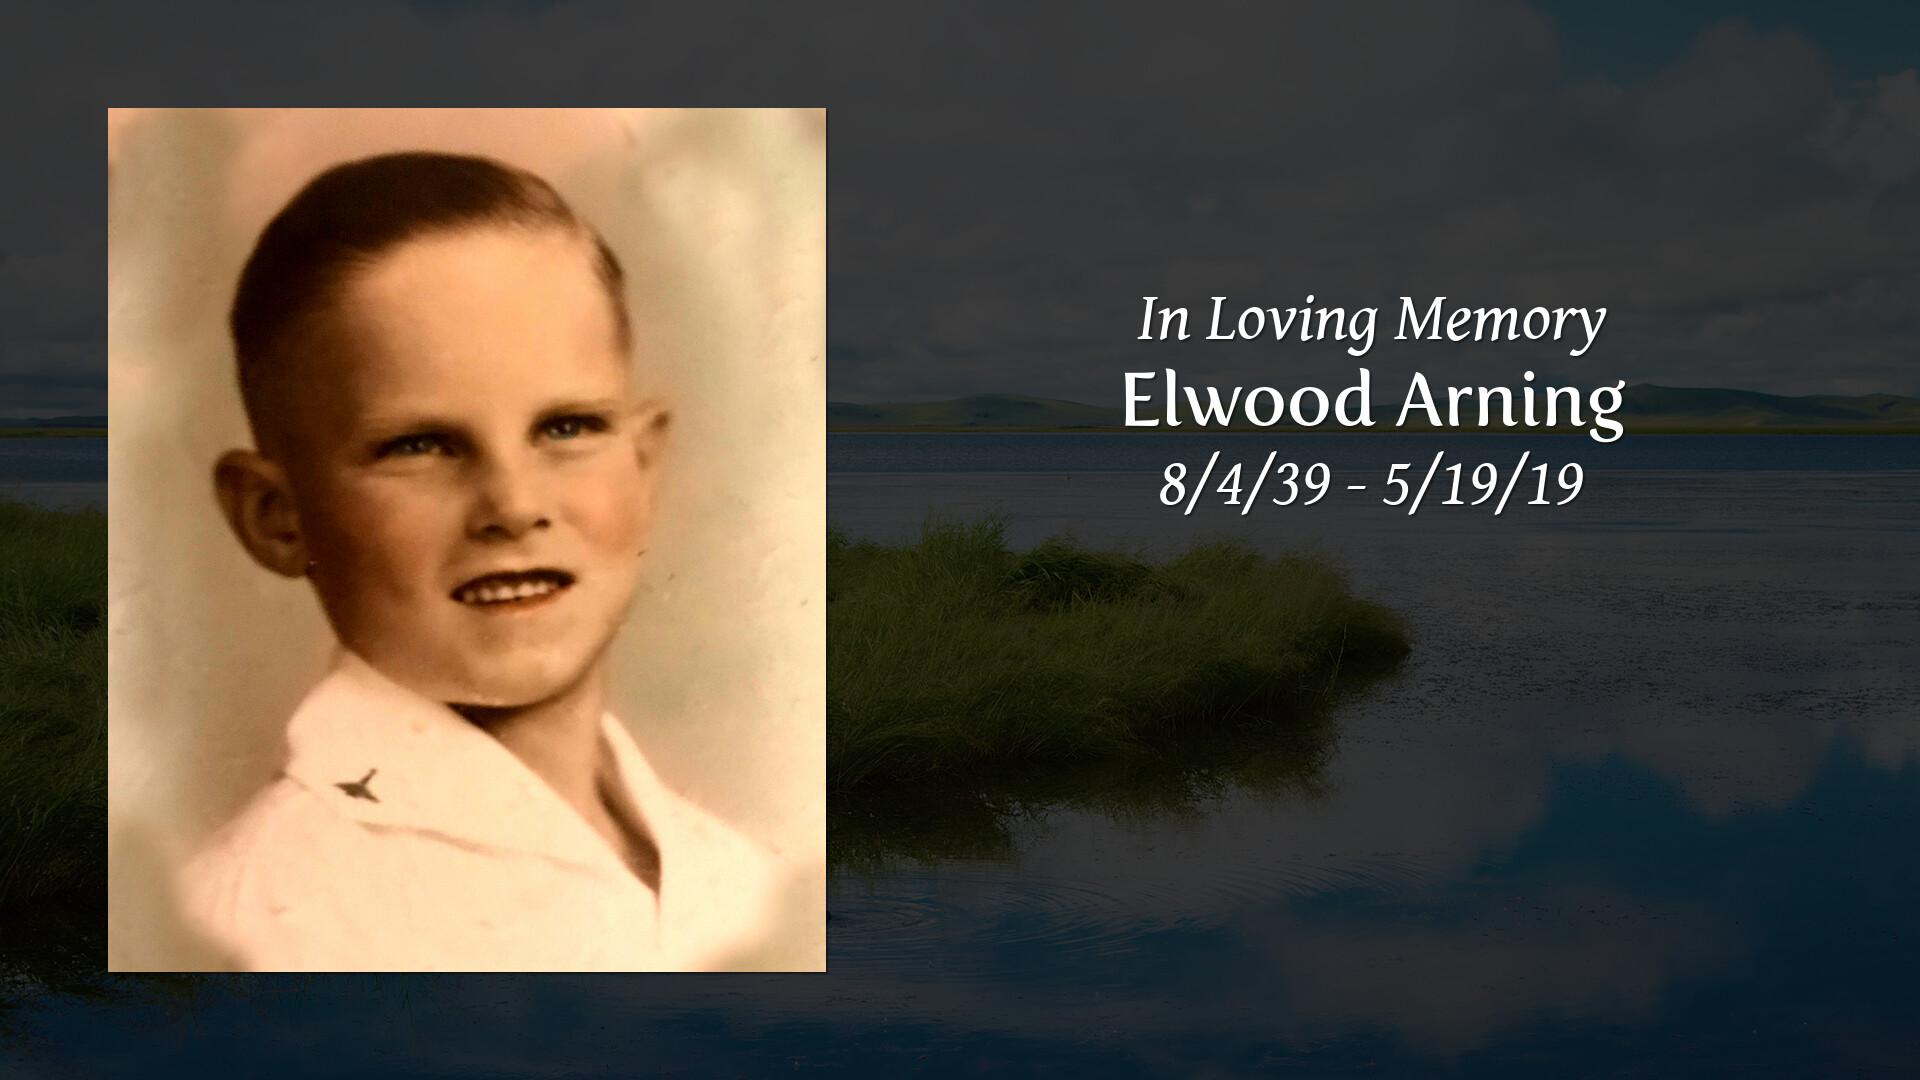 Obituary | Elwood Arning of Bellville, Texas | KNESEK FAMILY